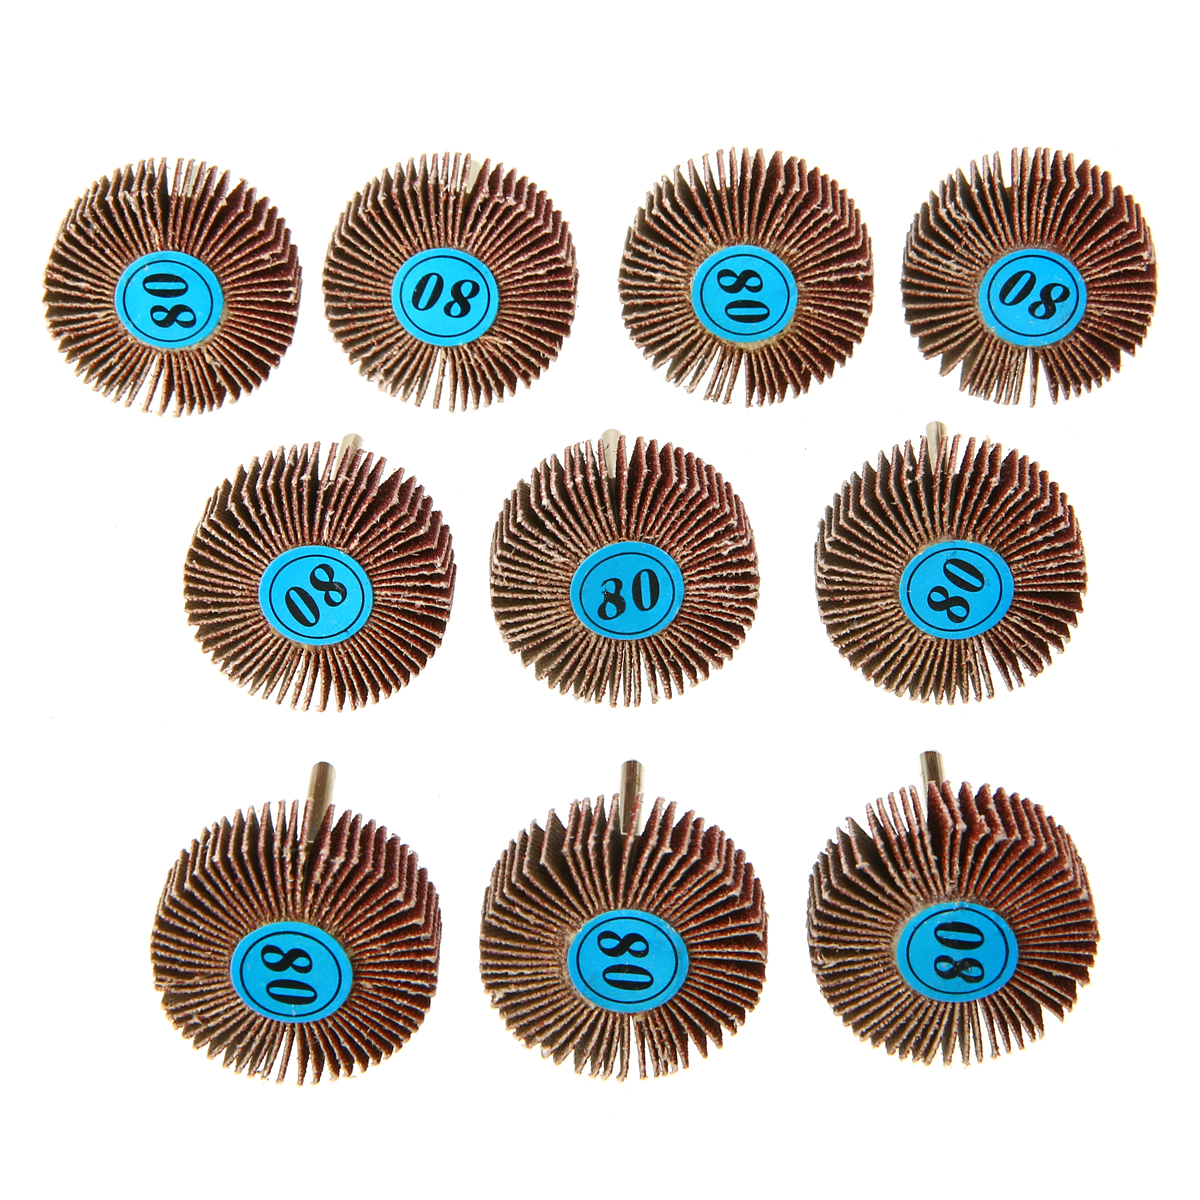 10pcs 80 Grit Abrasive Flap Wheels Sanding Discs Set Flap Sanding Disc Polish Rotary Tools For Power Tool